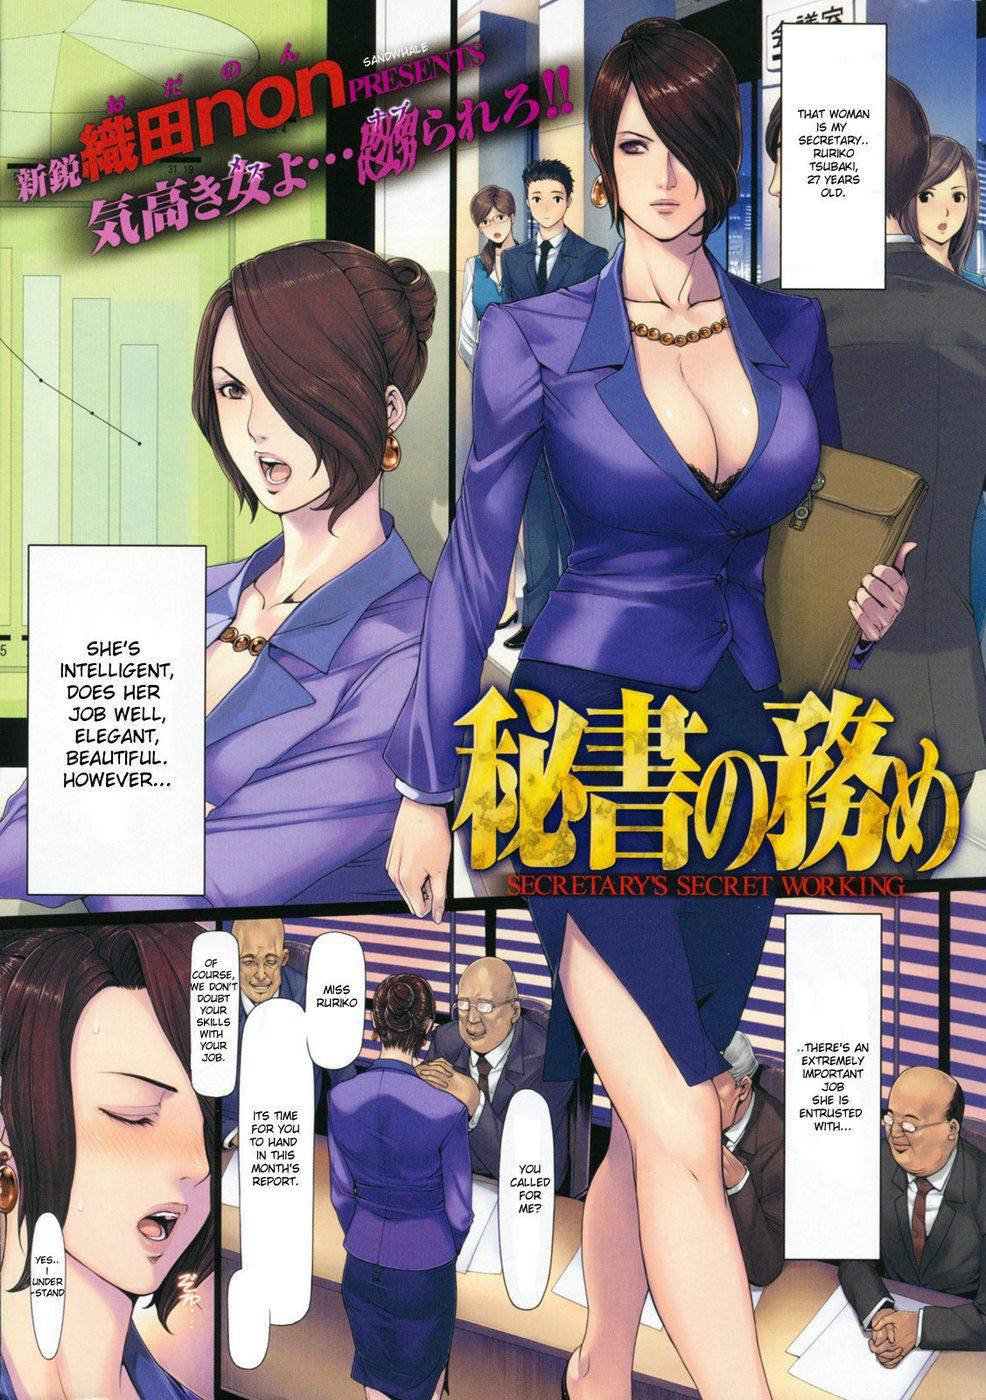 Secretary's Secret Working- Hentai porn comics 8 muses